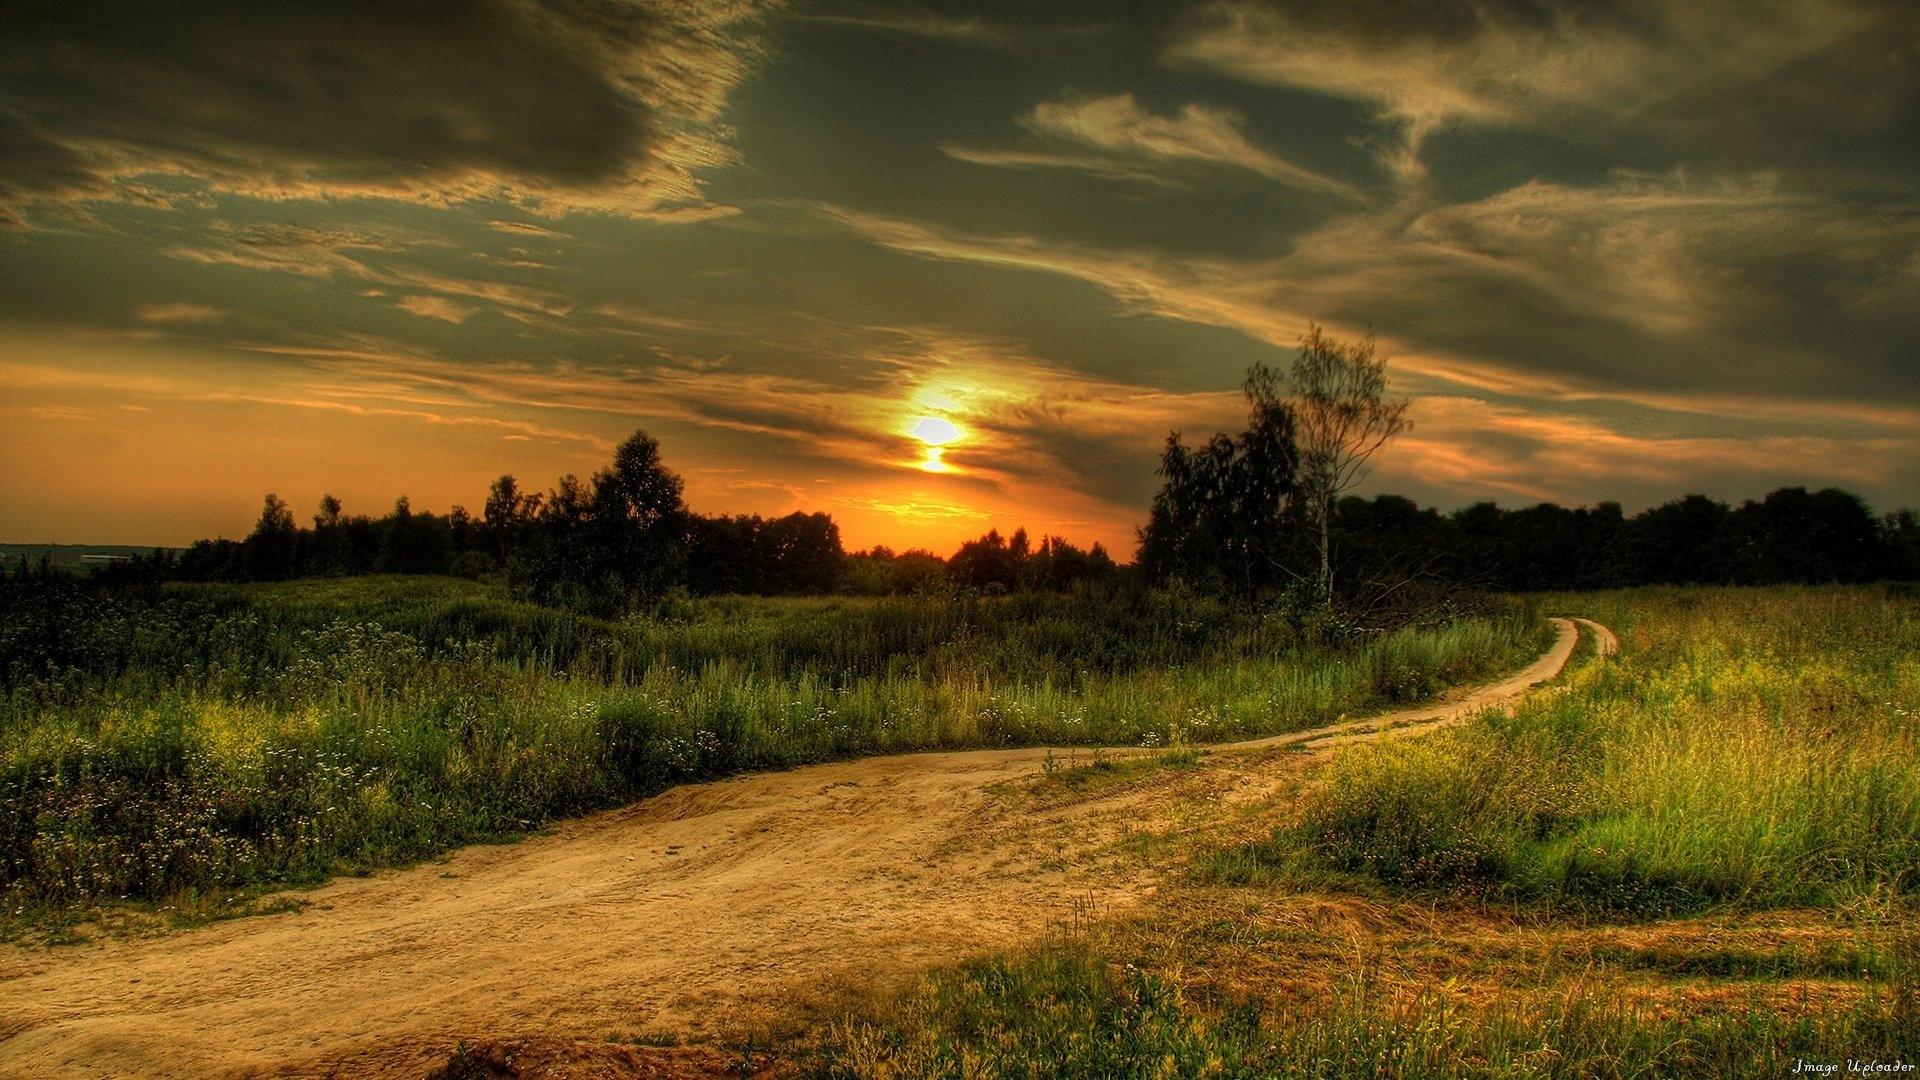 Decline Road Country Signature Evening Twilight Wood Grass Vegetation Summer Field